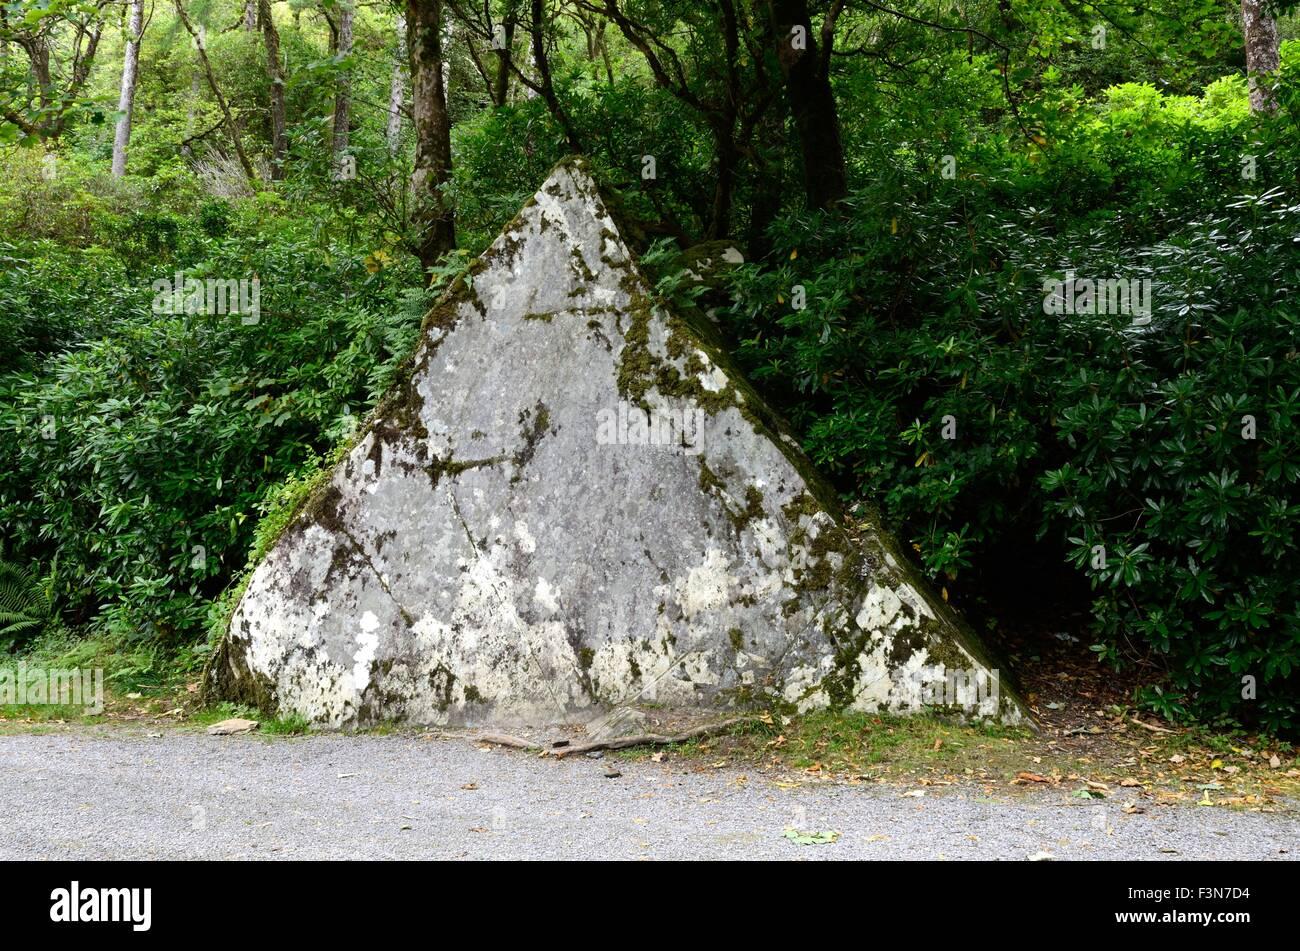 The Ironing Stone Kylemore Abbey Connemara County Galway Ireland - Stock Image